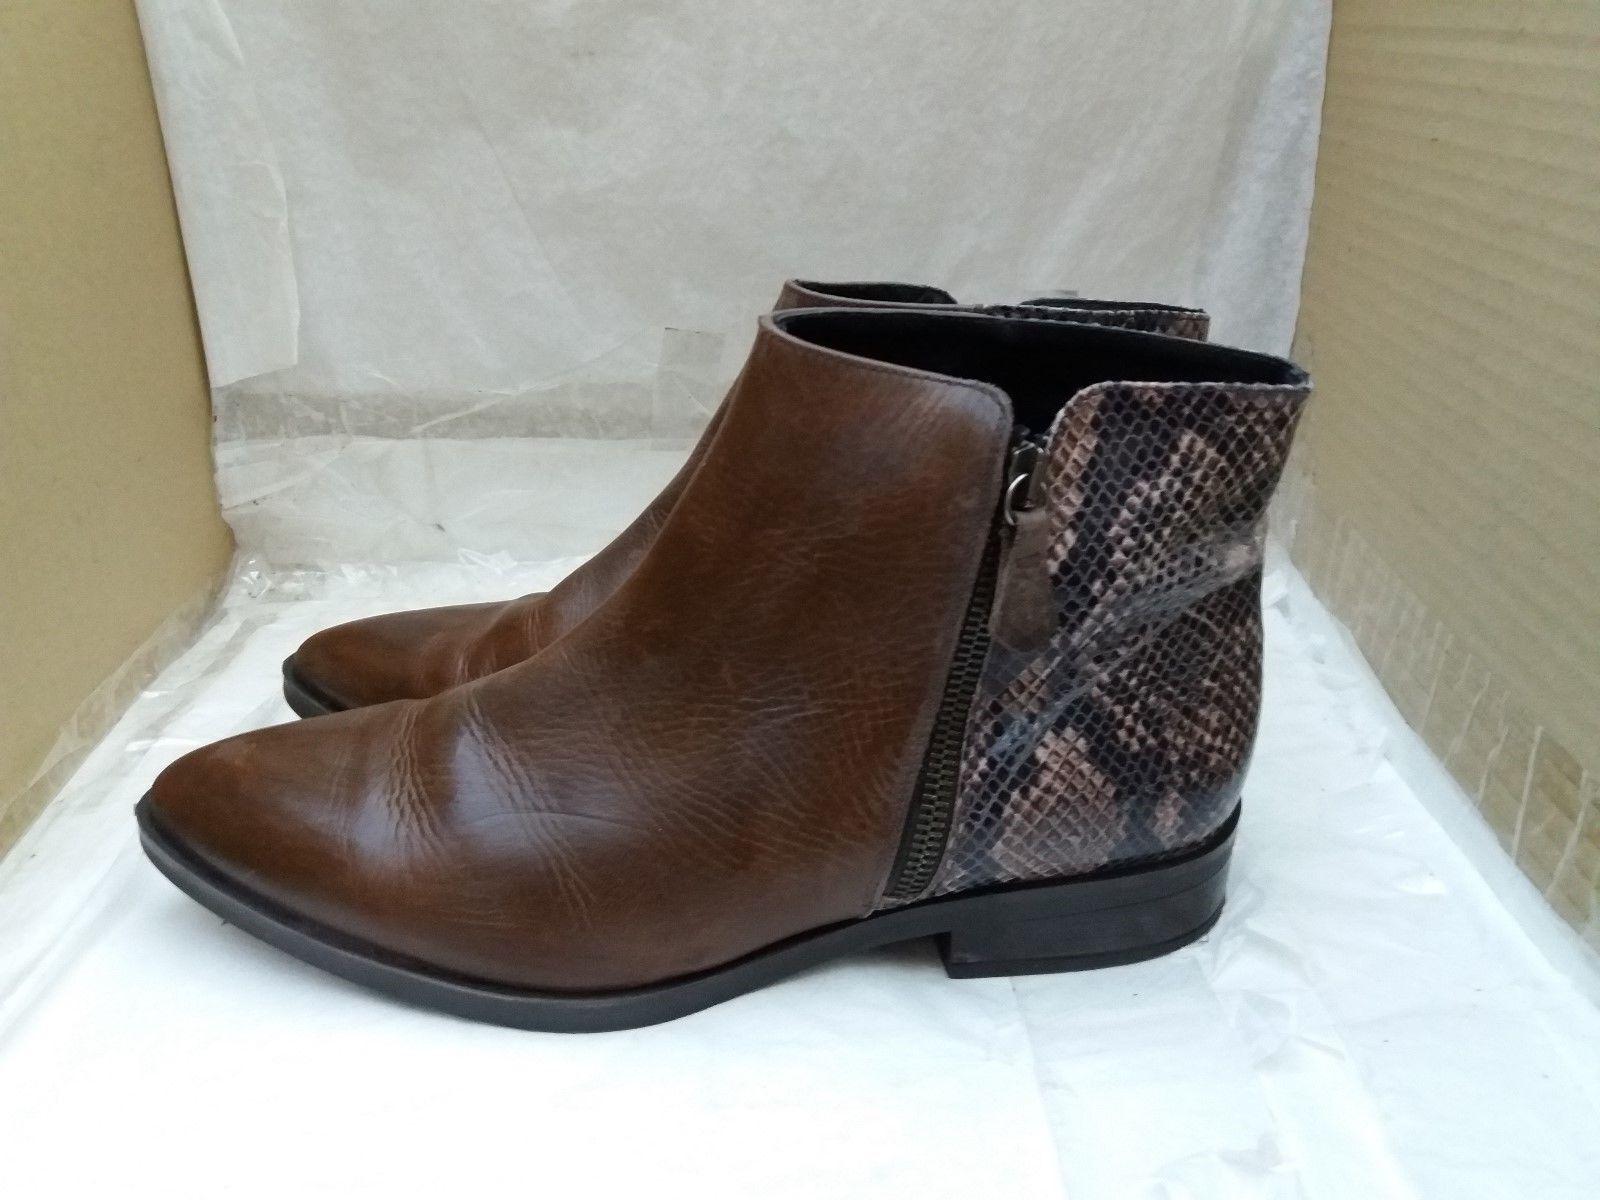 ESTEFANIA MARCO Snakeskin Print Braun Soft Leder Ankle Stiefel - UK 7/EU 41